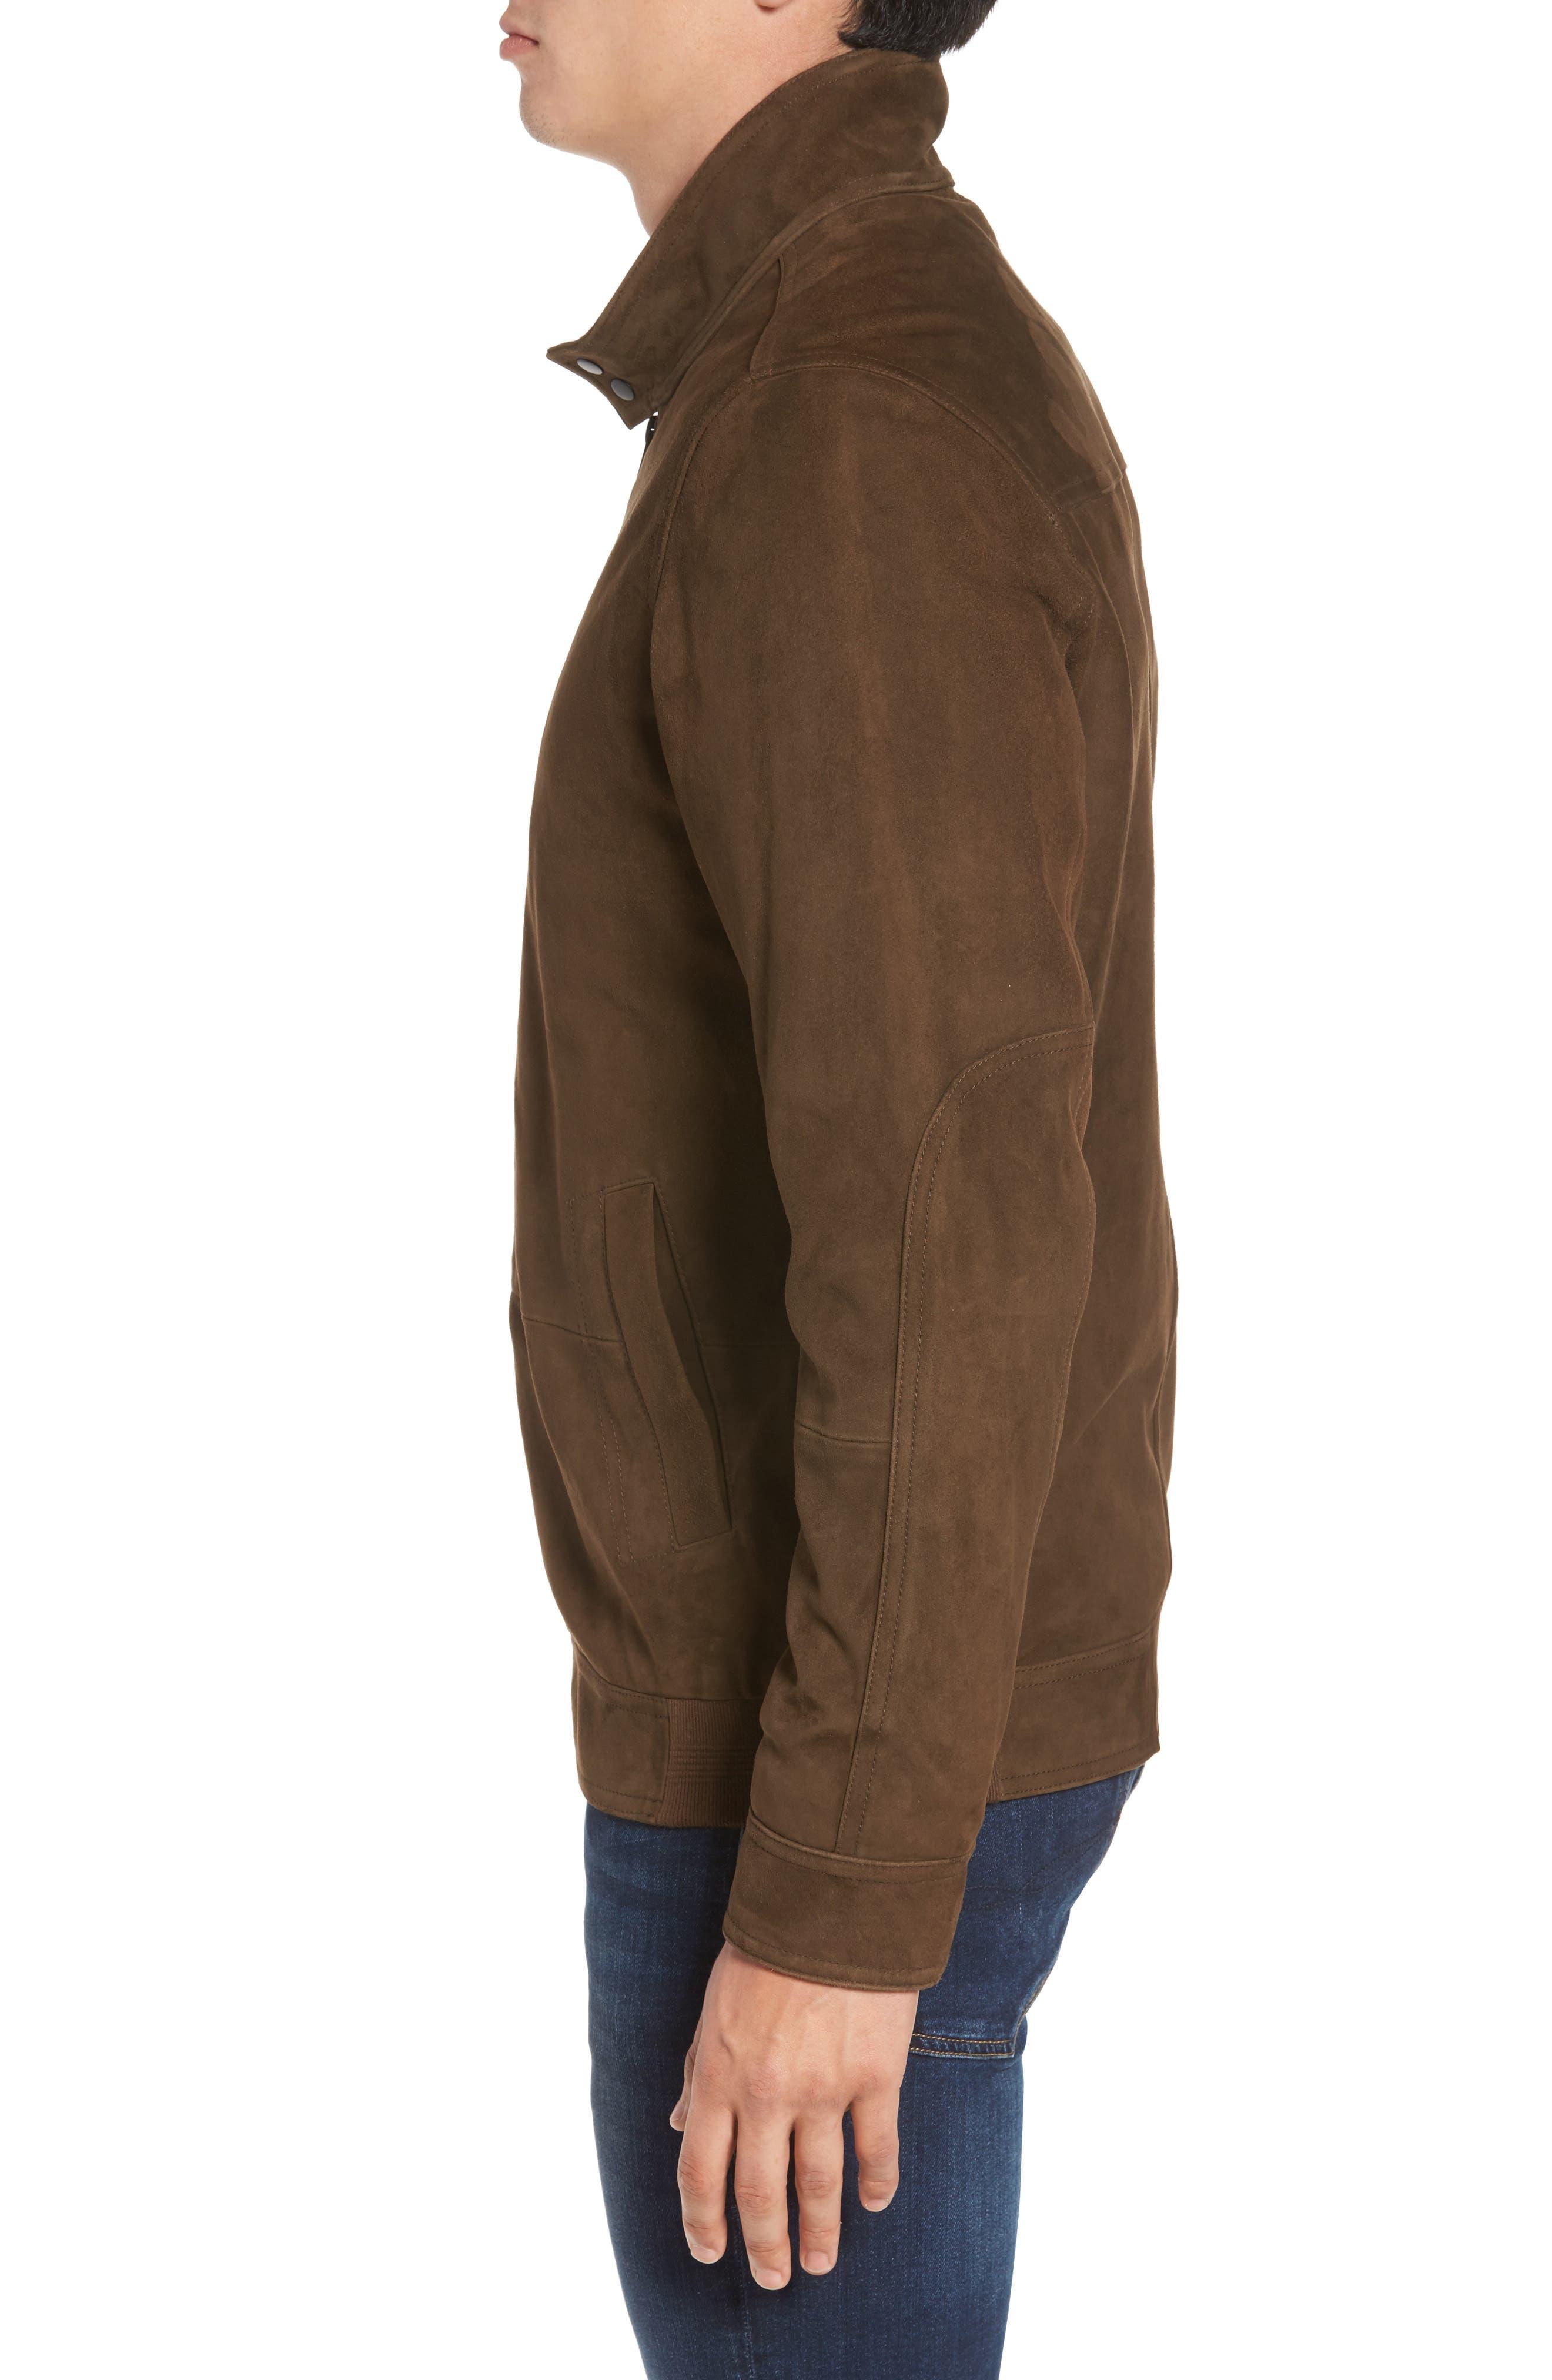 Alternate Image 3  - Rodd & Gunn Avondale Suede Jacket